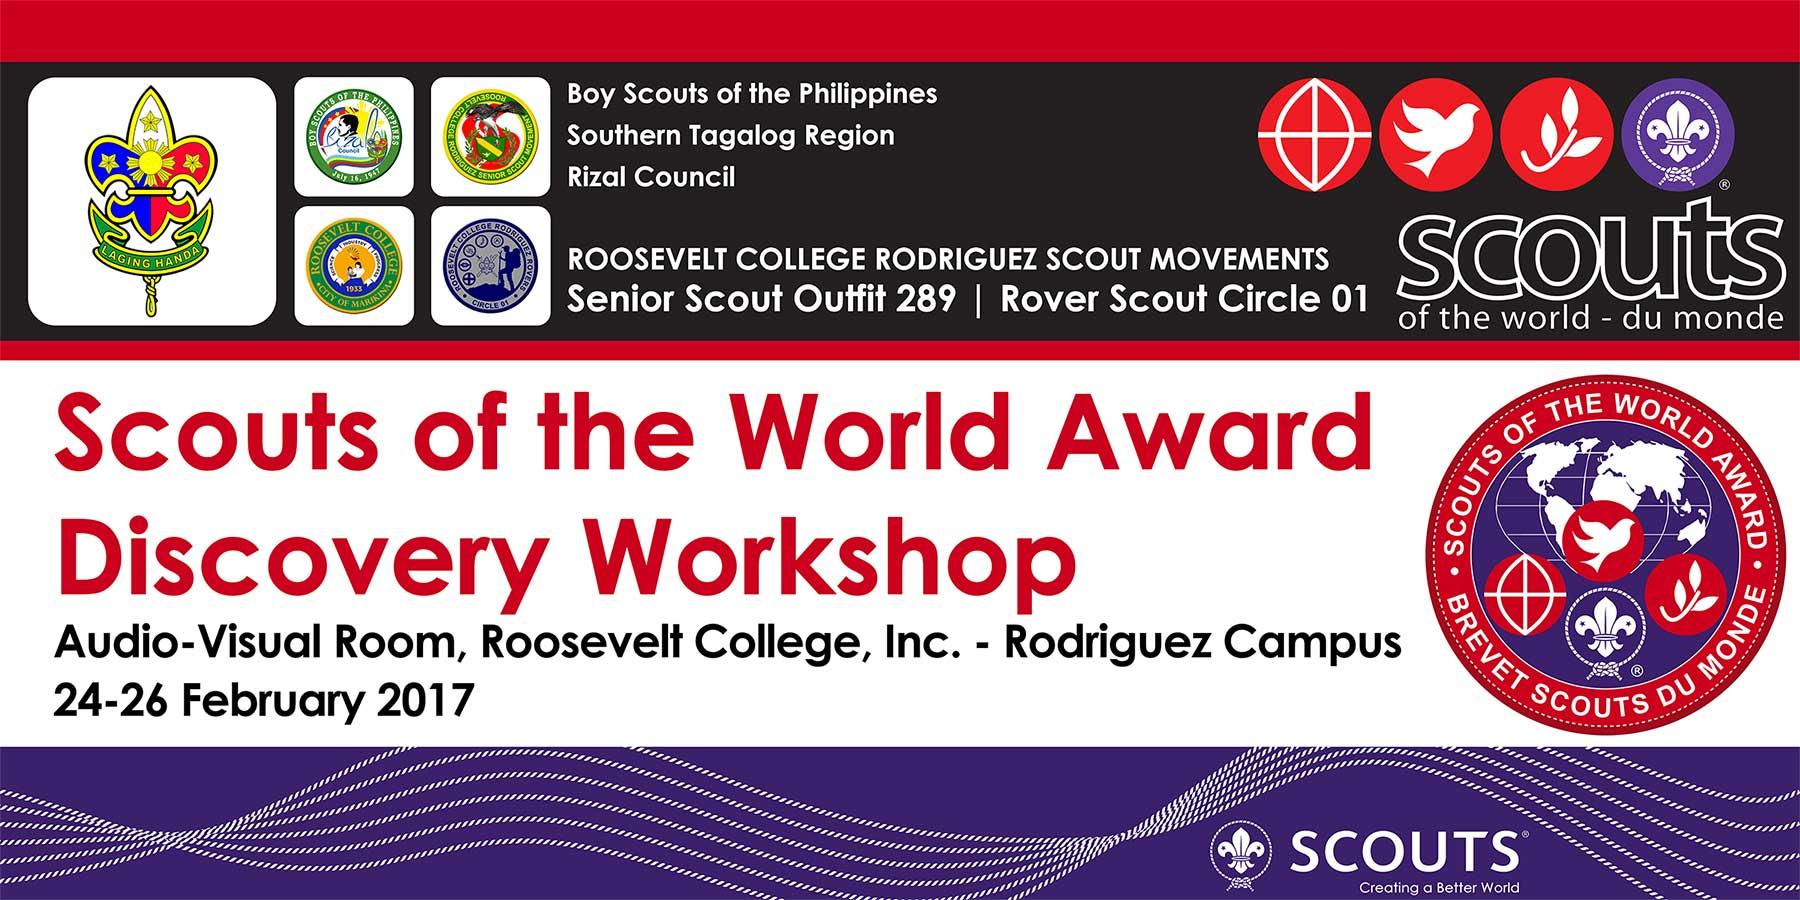 SW Award Discovery (RCR)